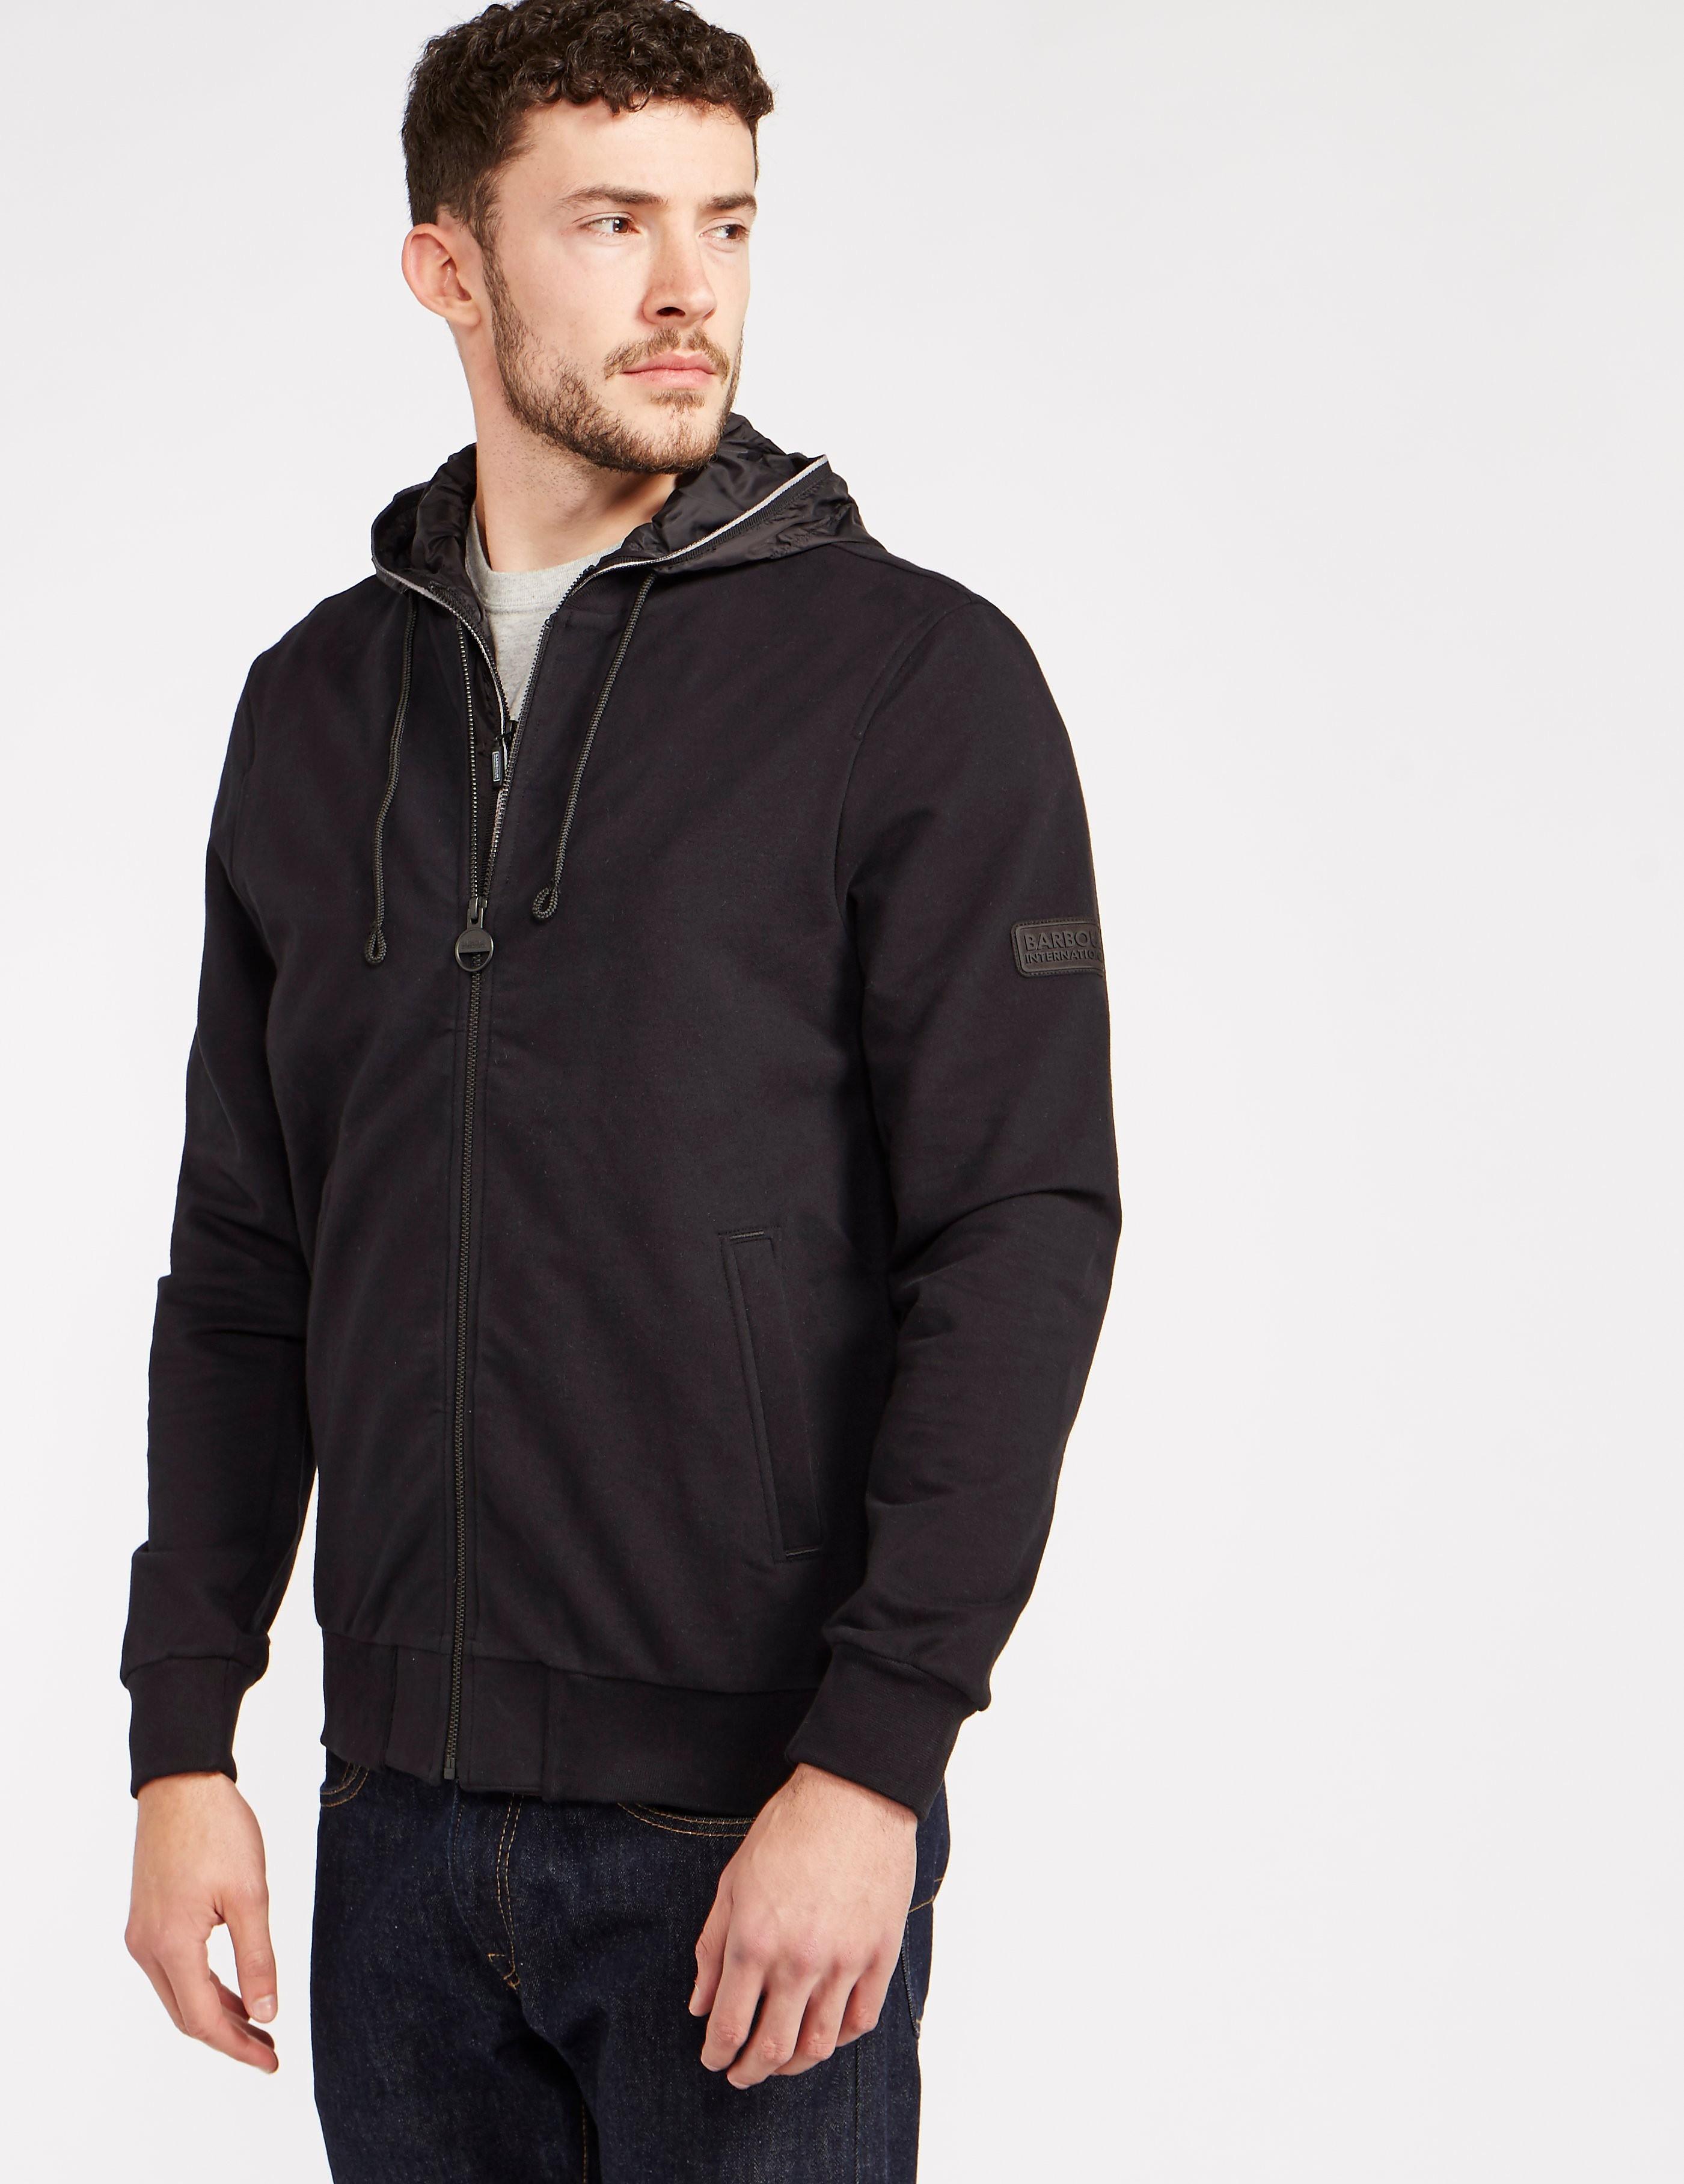 Barbour Full-Zip Hooded Jacket